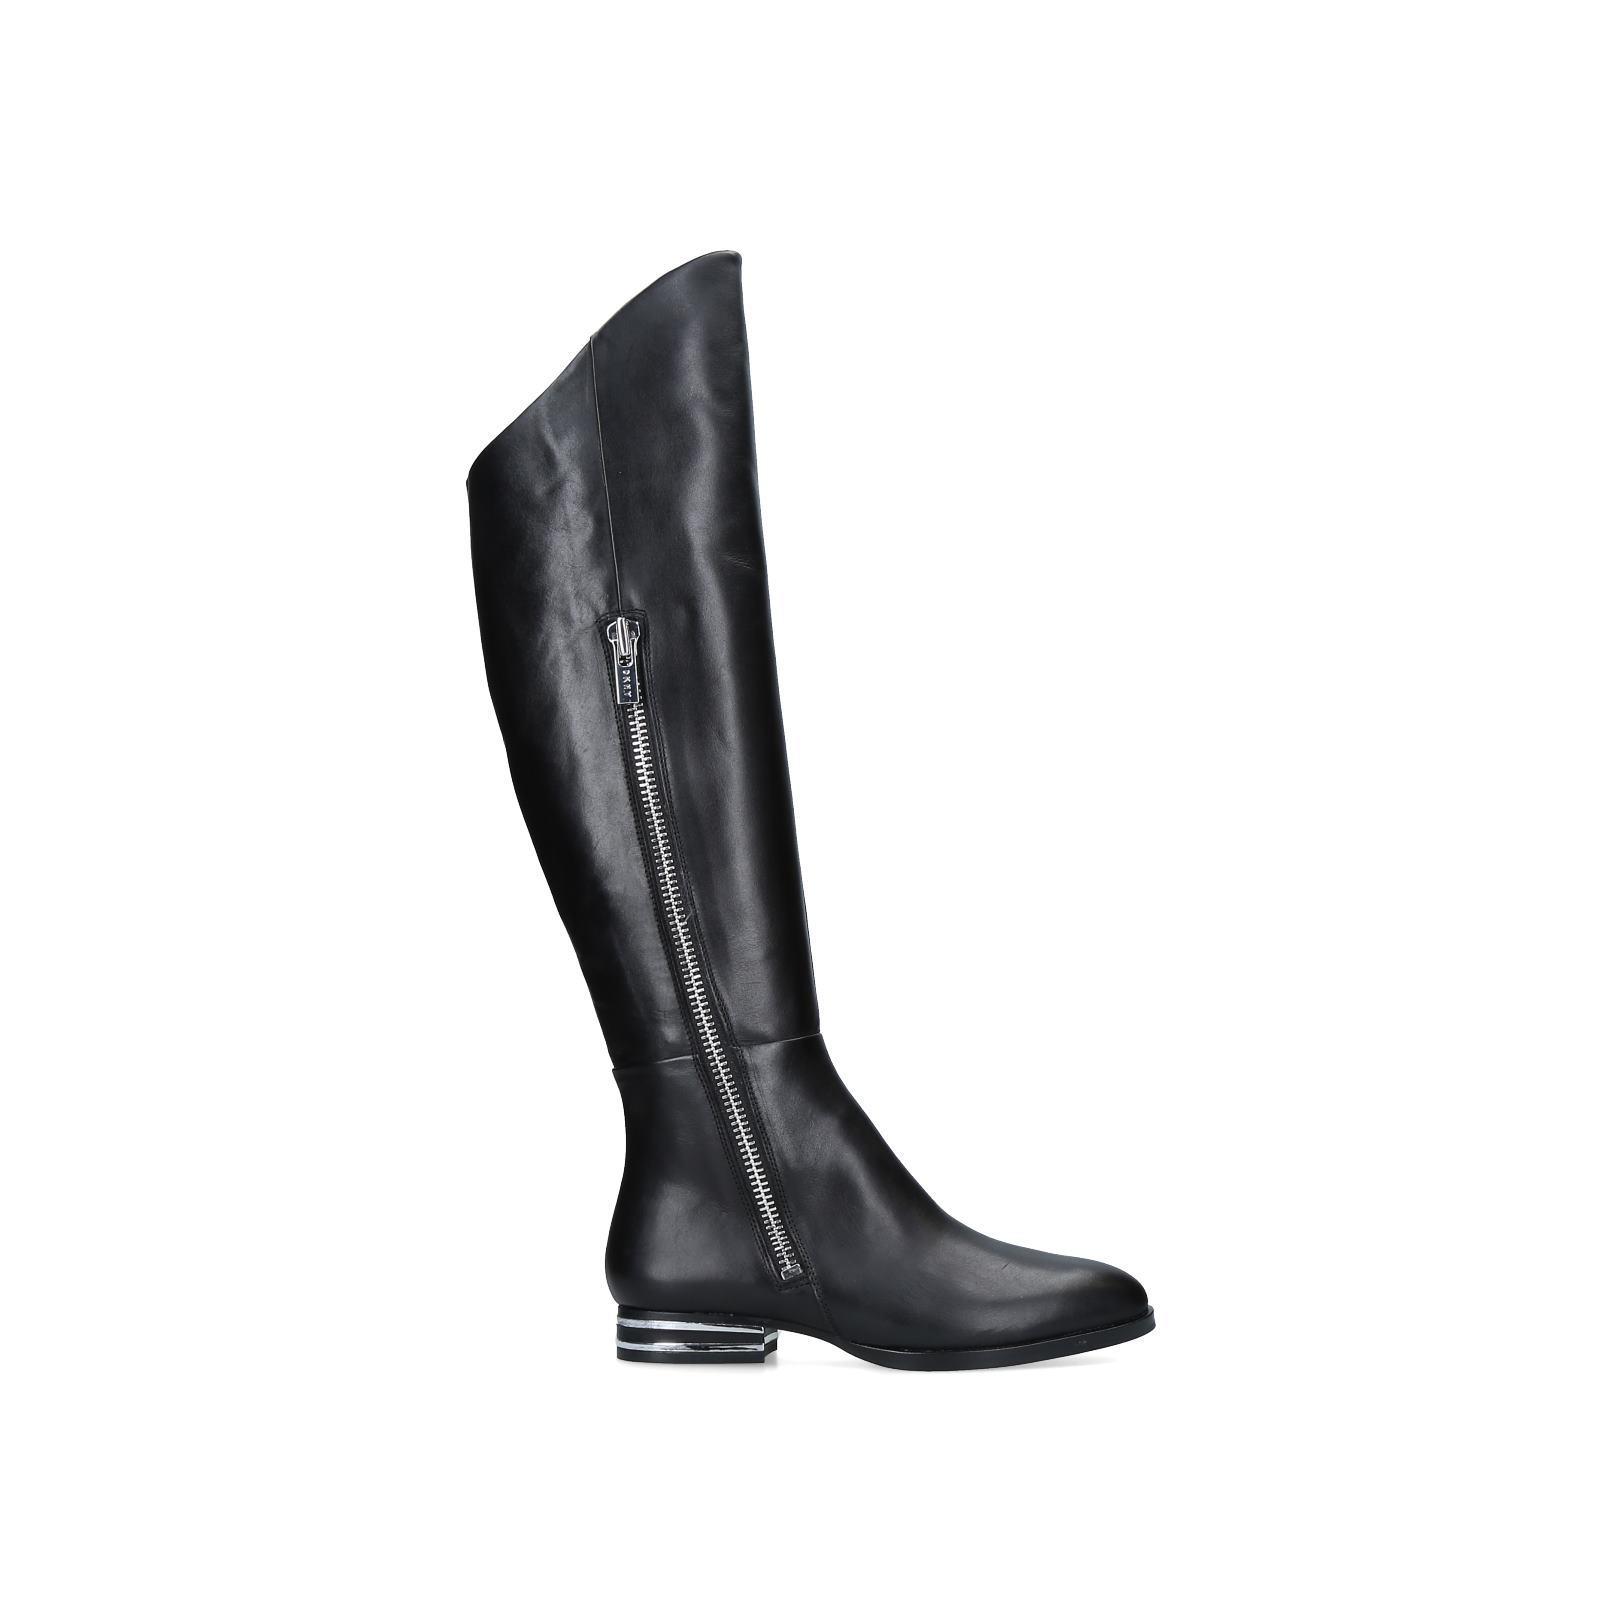 LOLITA - DKNY High Leg Boots